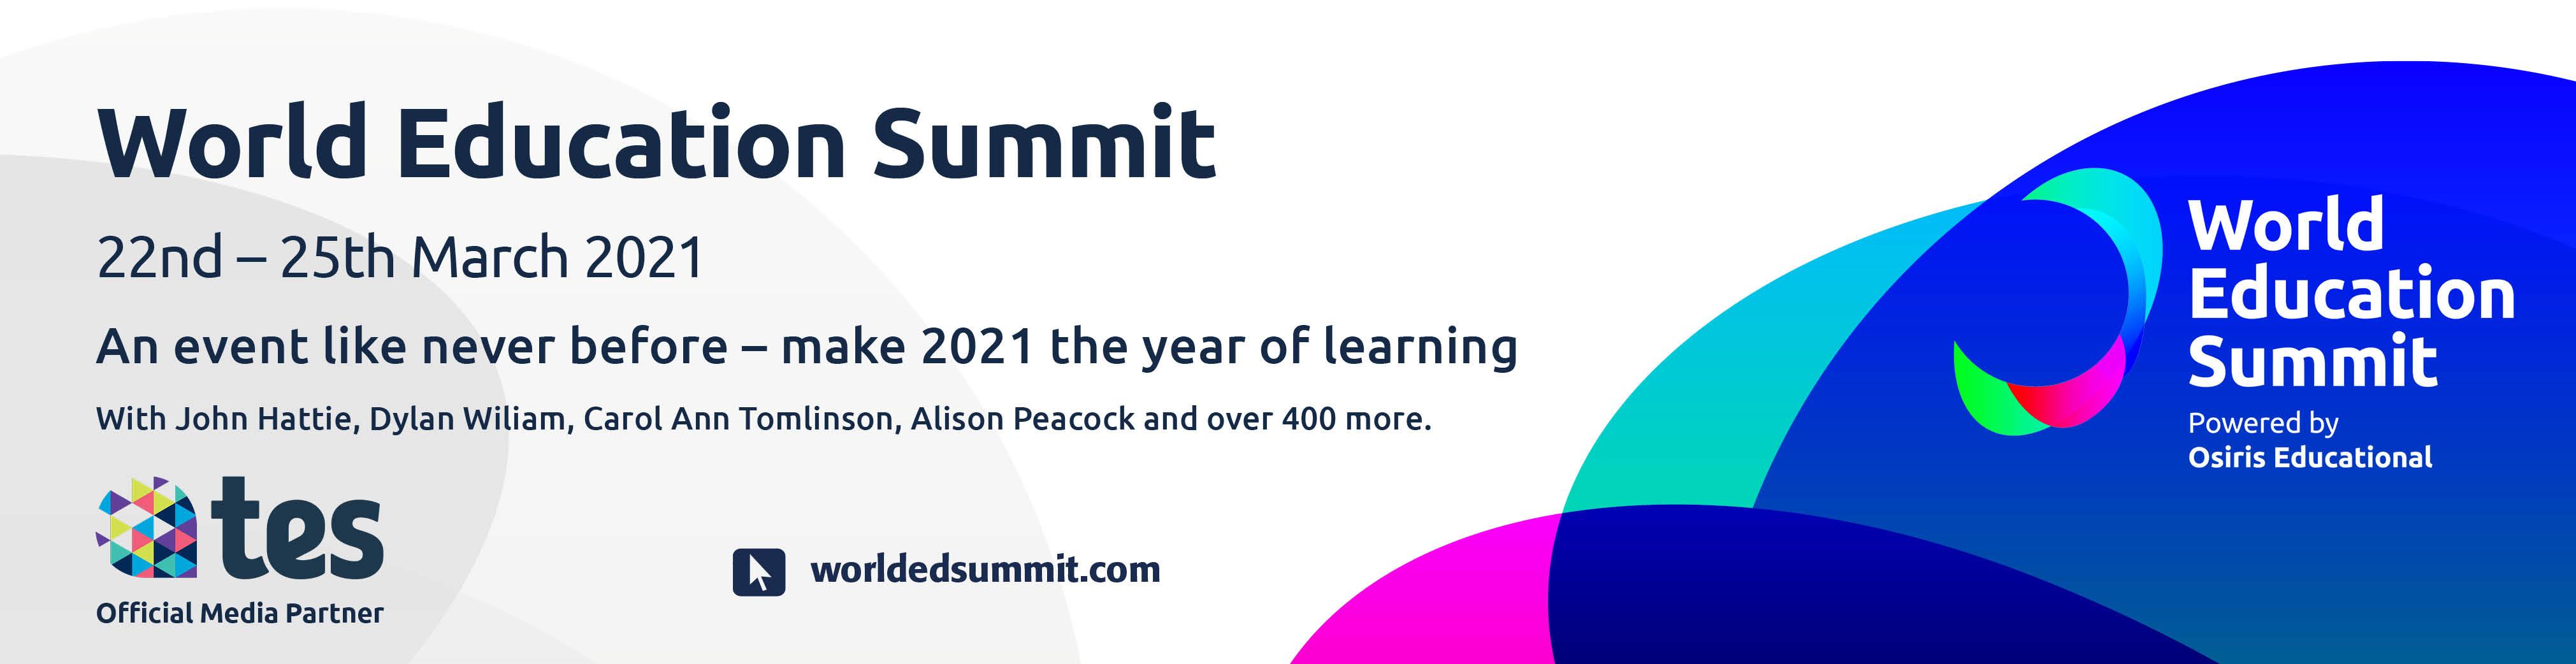 World Education Summit